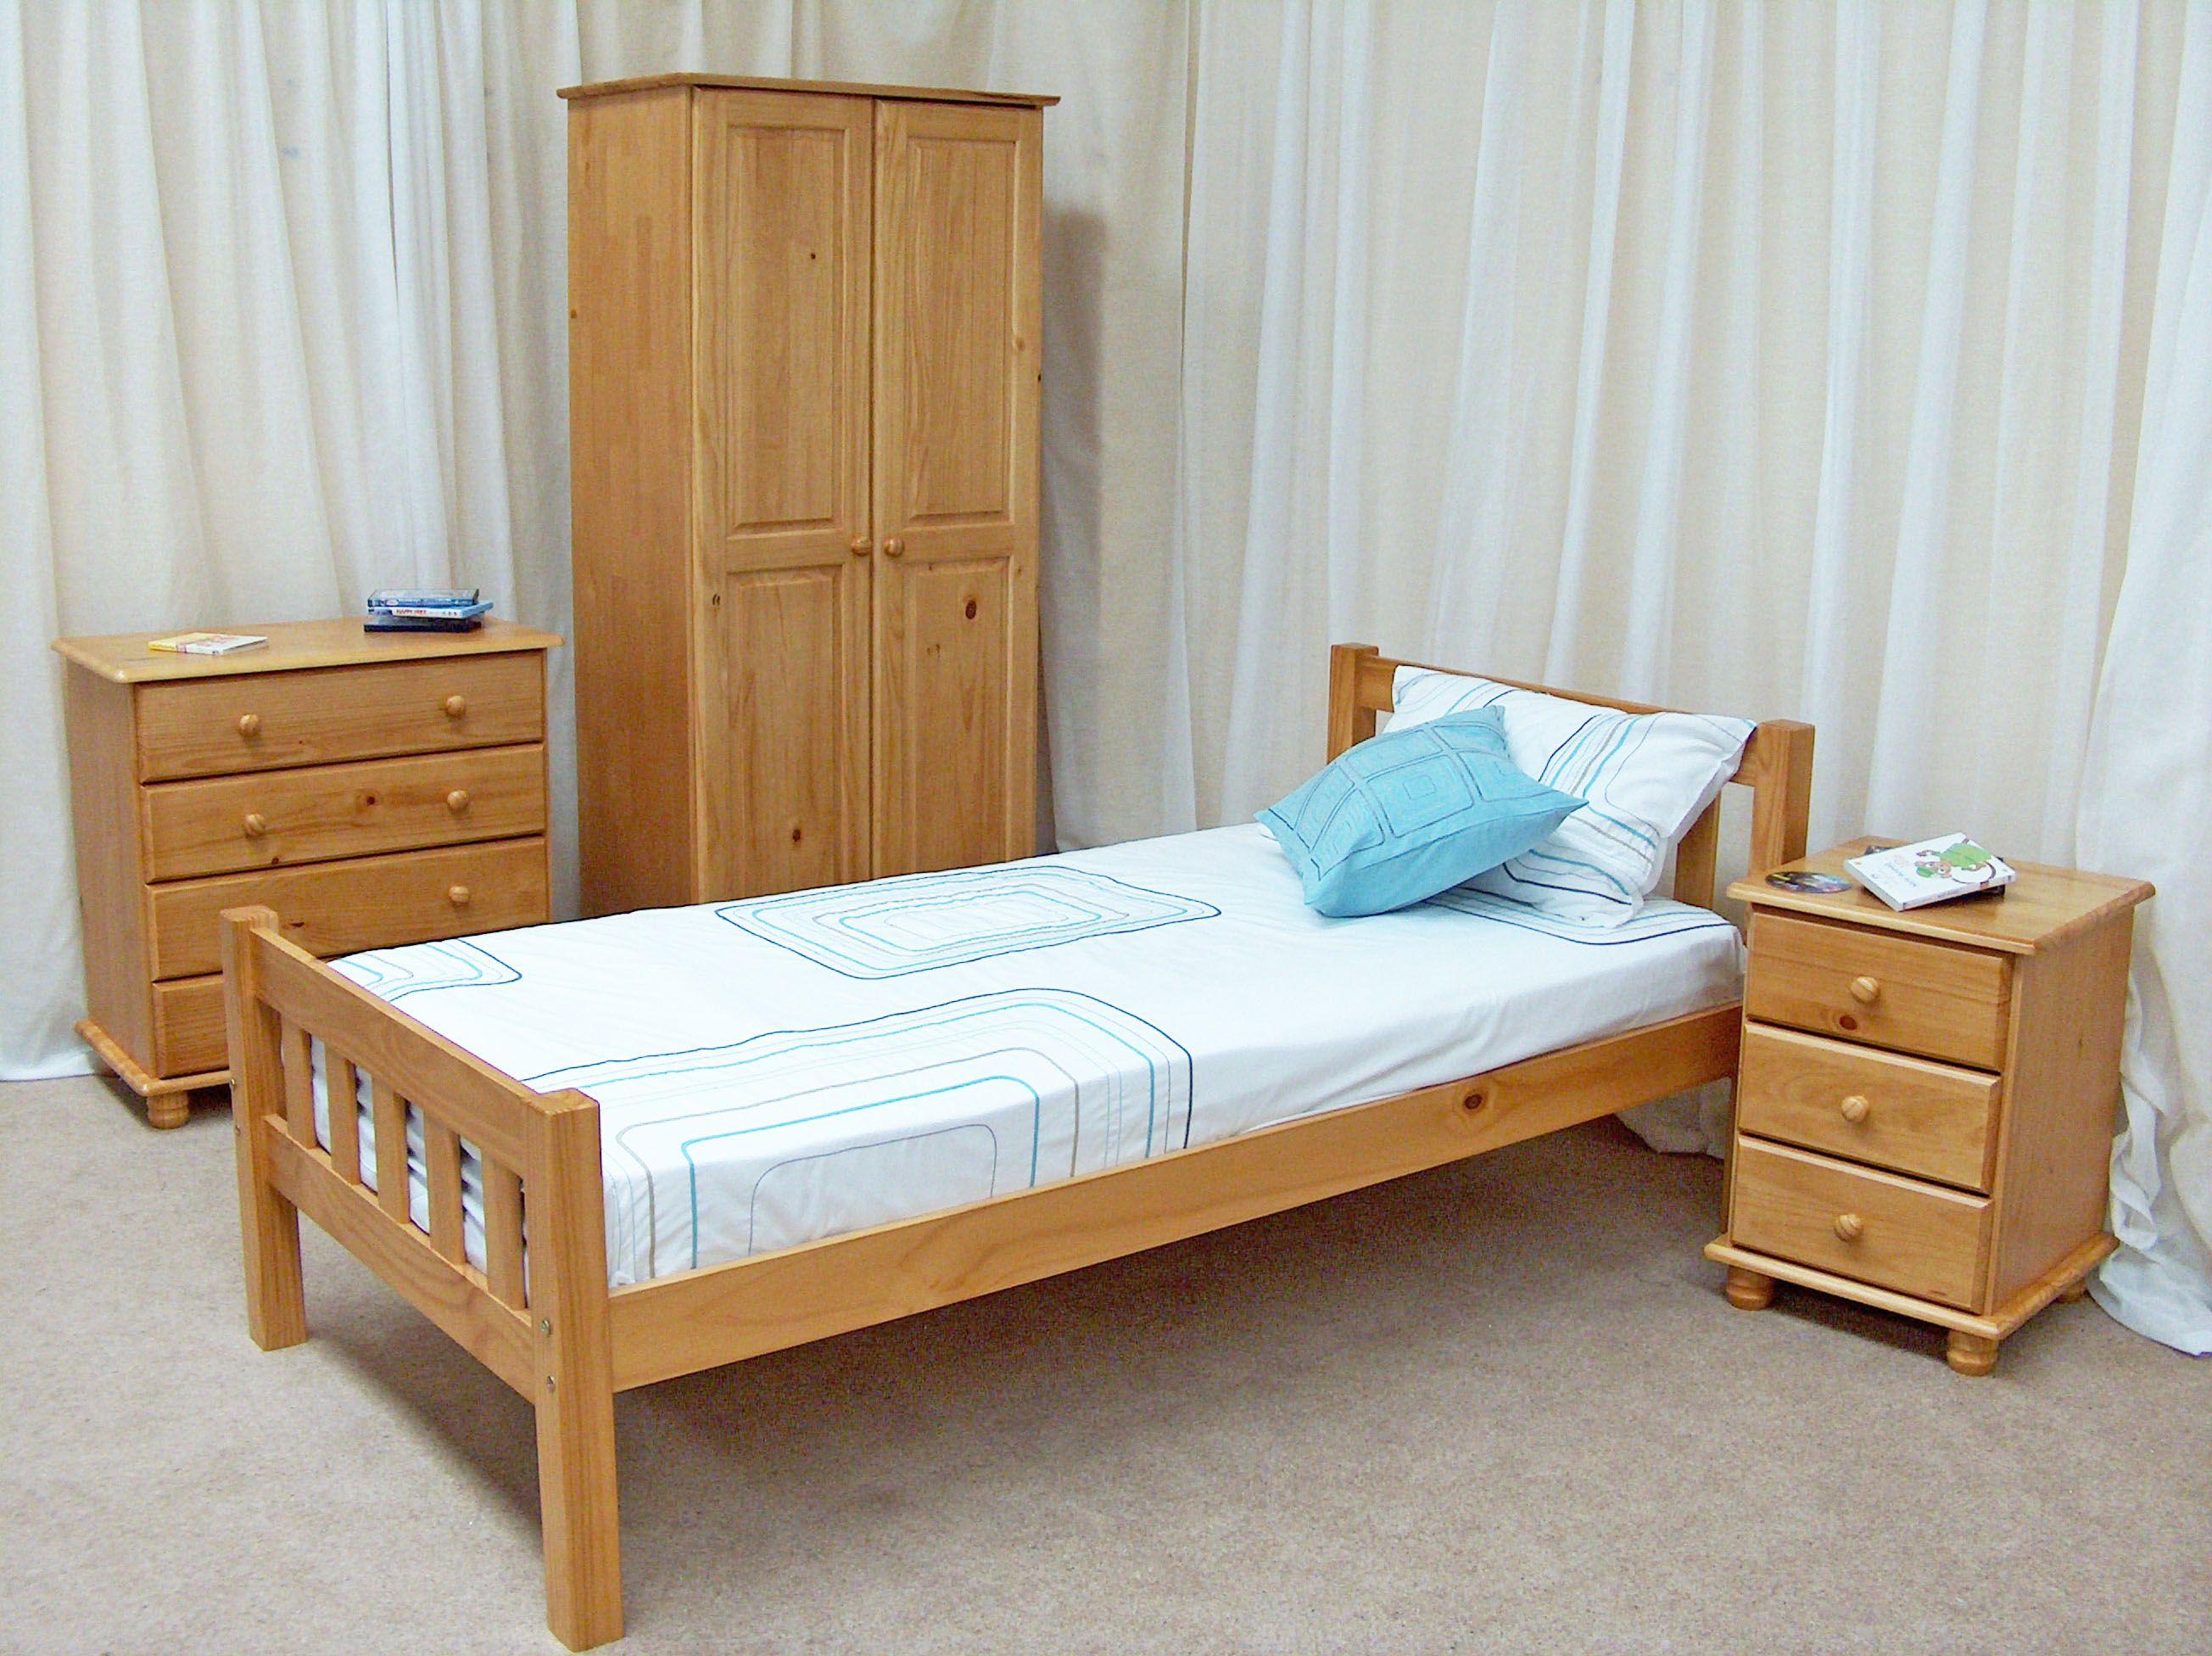 Cheap bedroom sets ayhomescheapbedroom